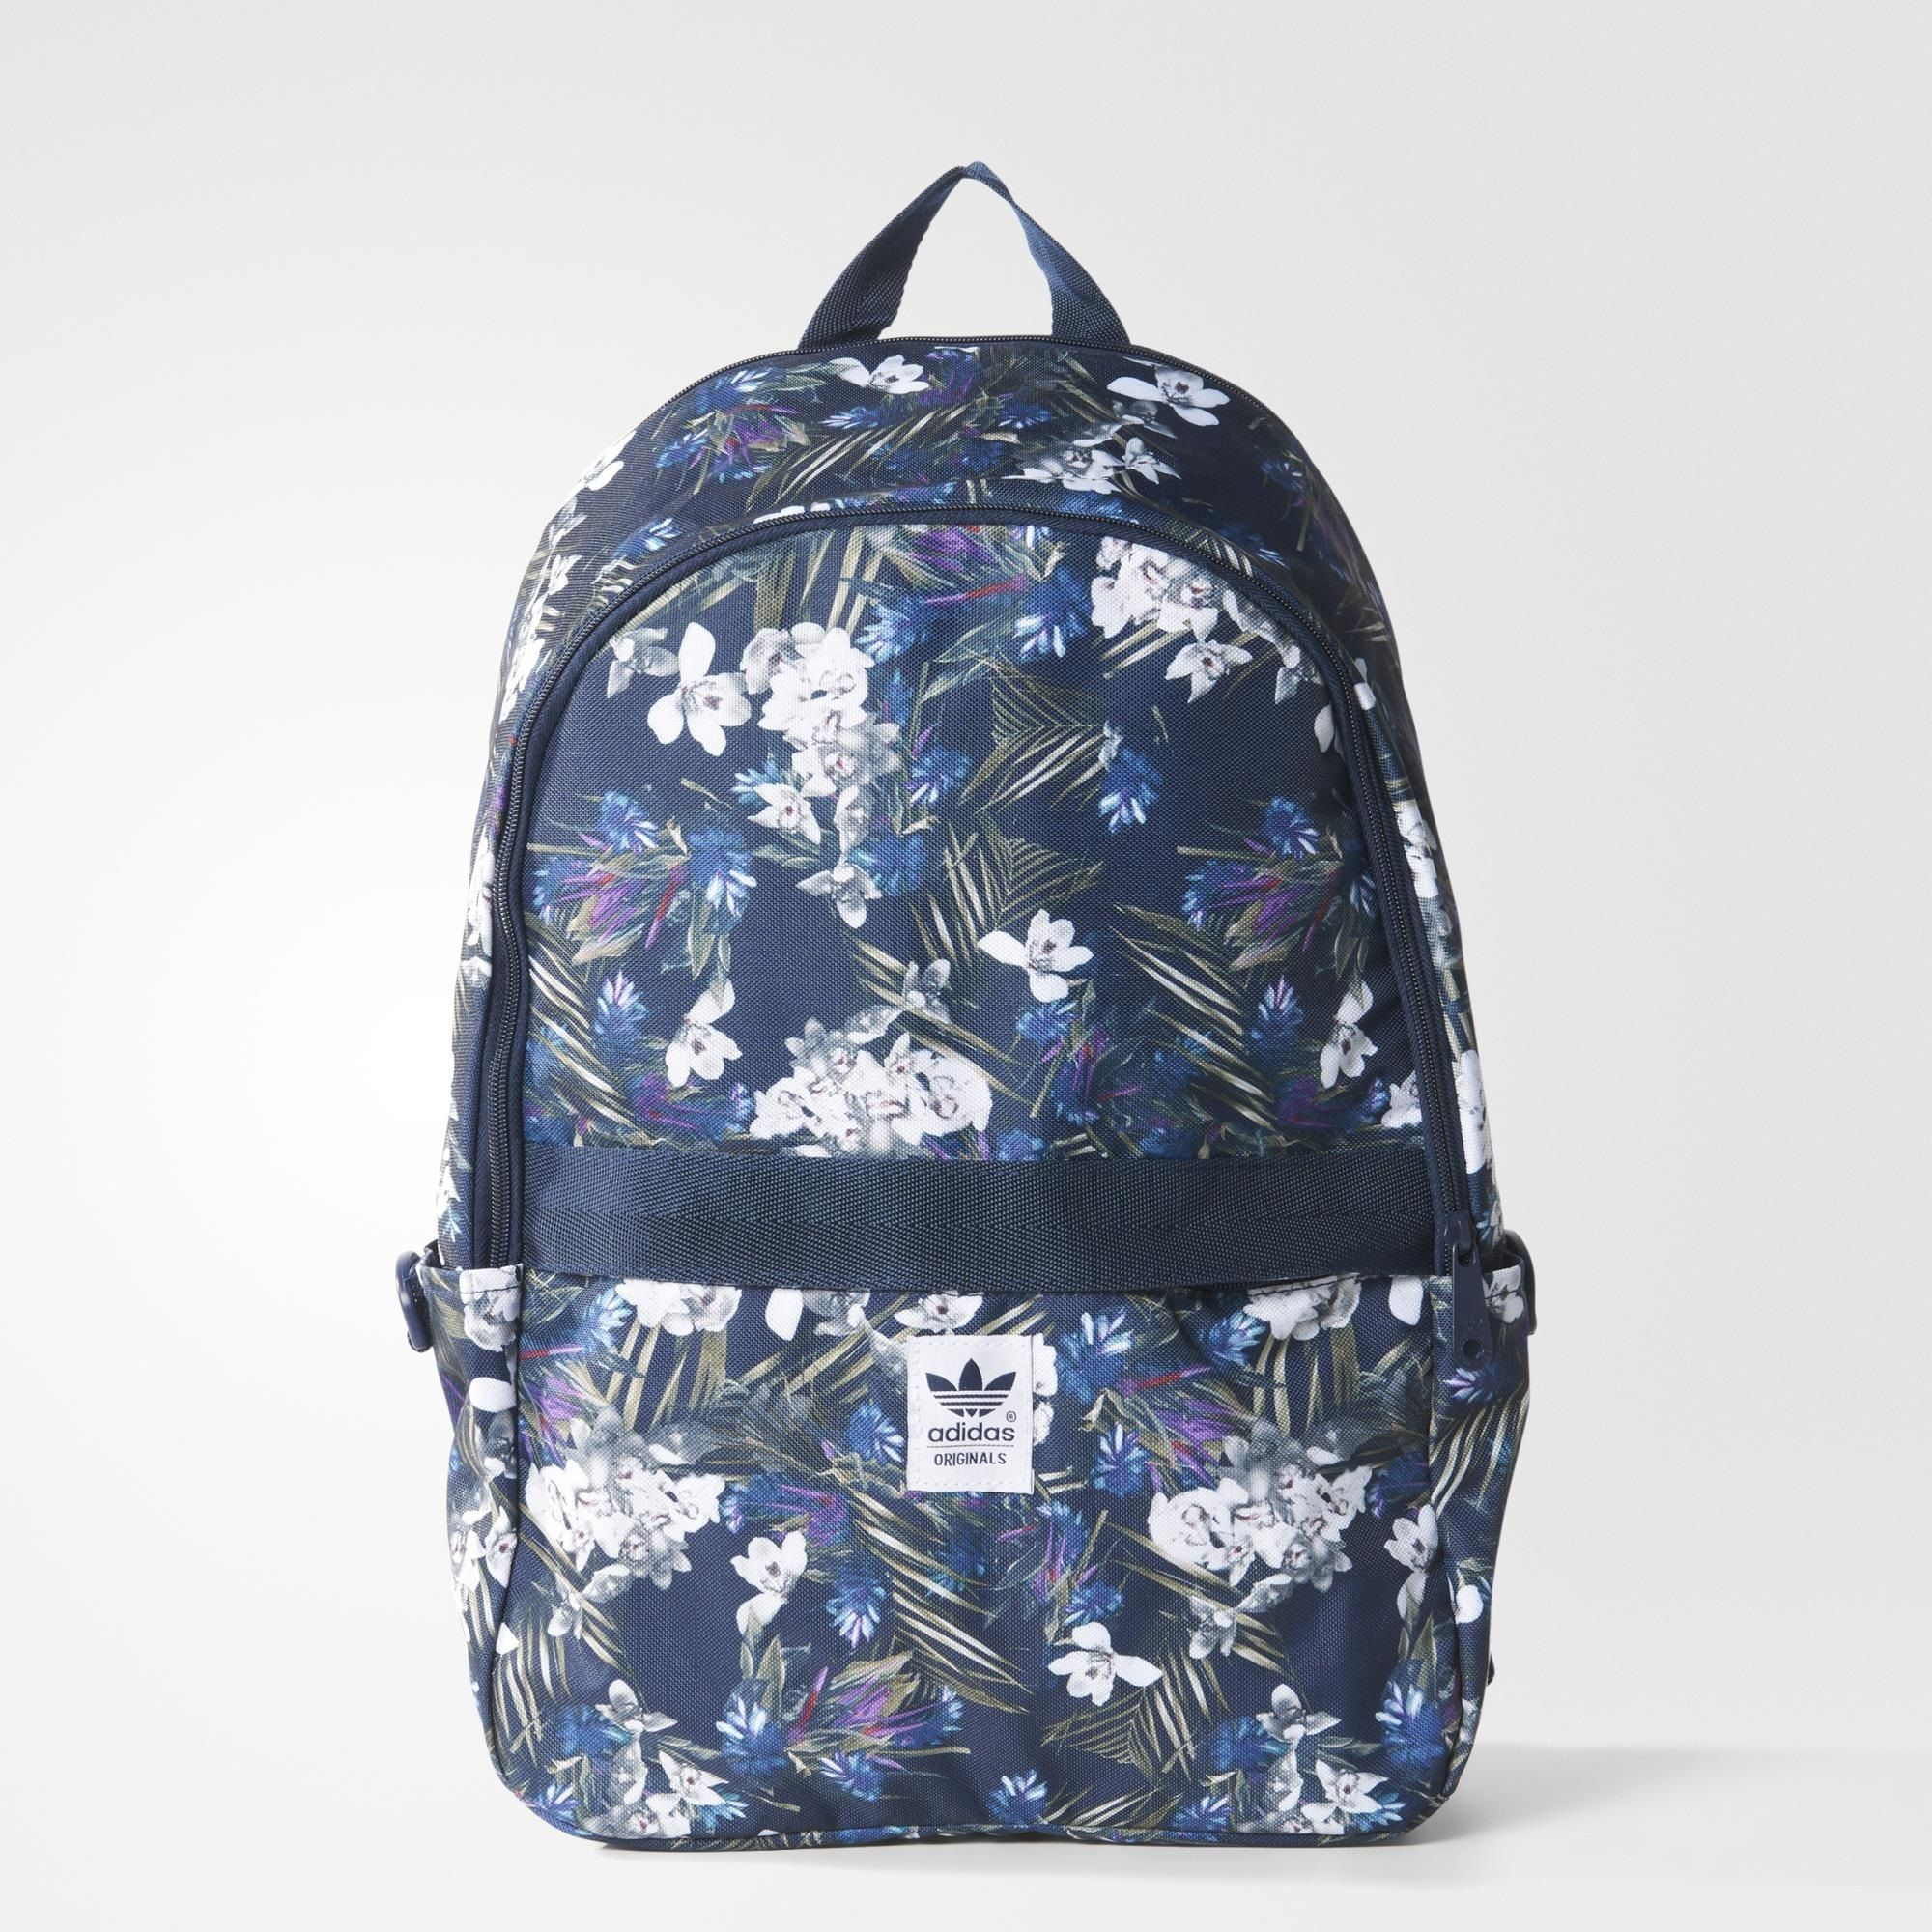 Buy adidas rucksack backpack   OFF50% Discounted b24ea95c750c9